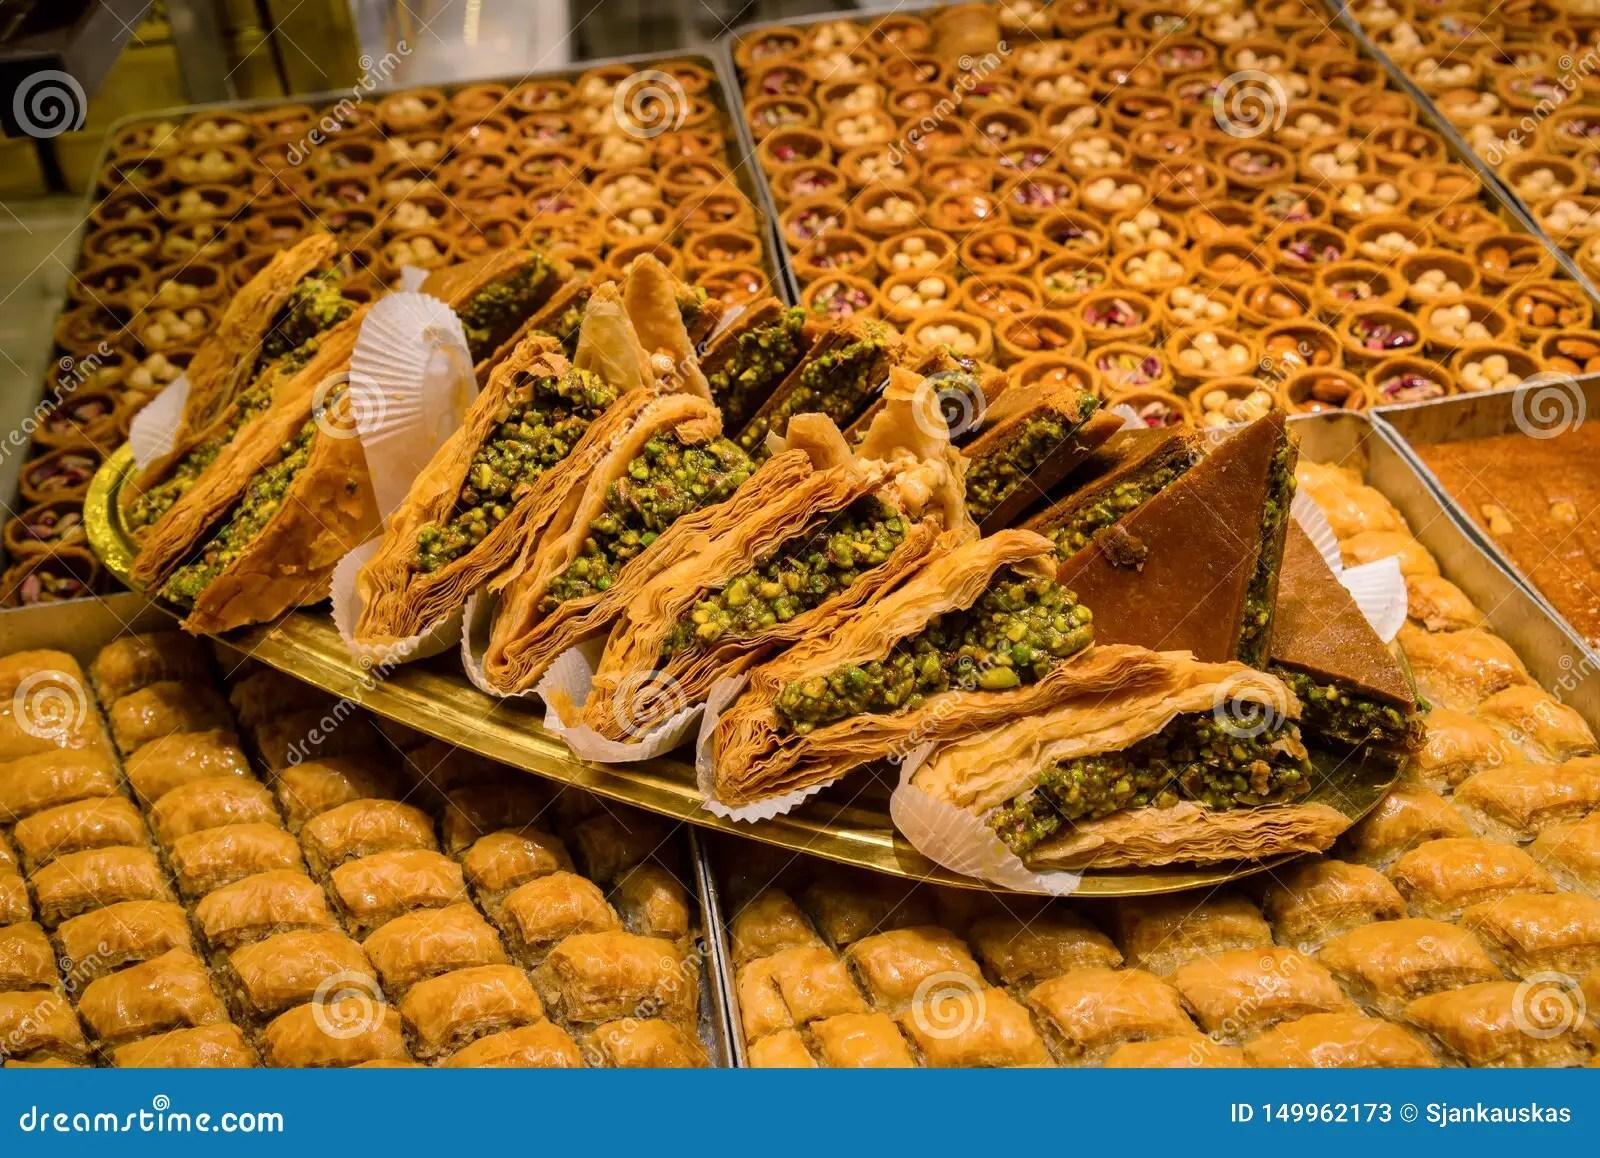 turkish baklava made of